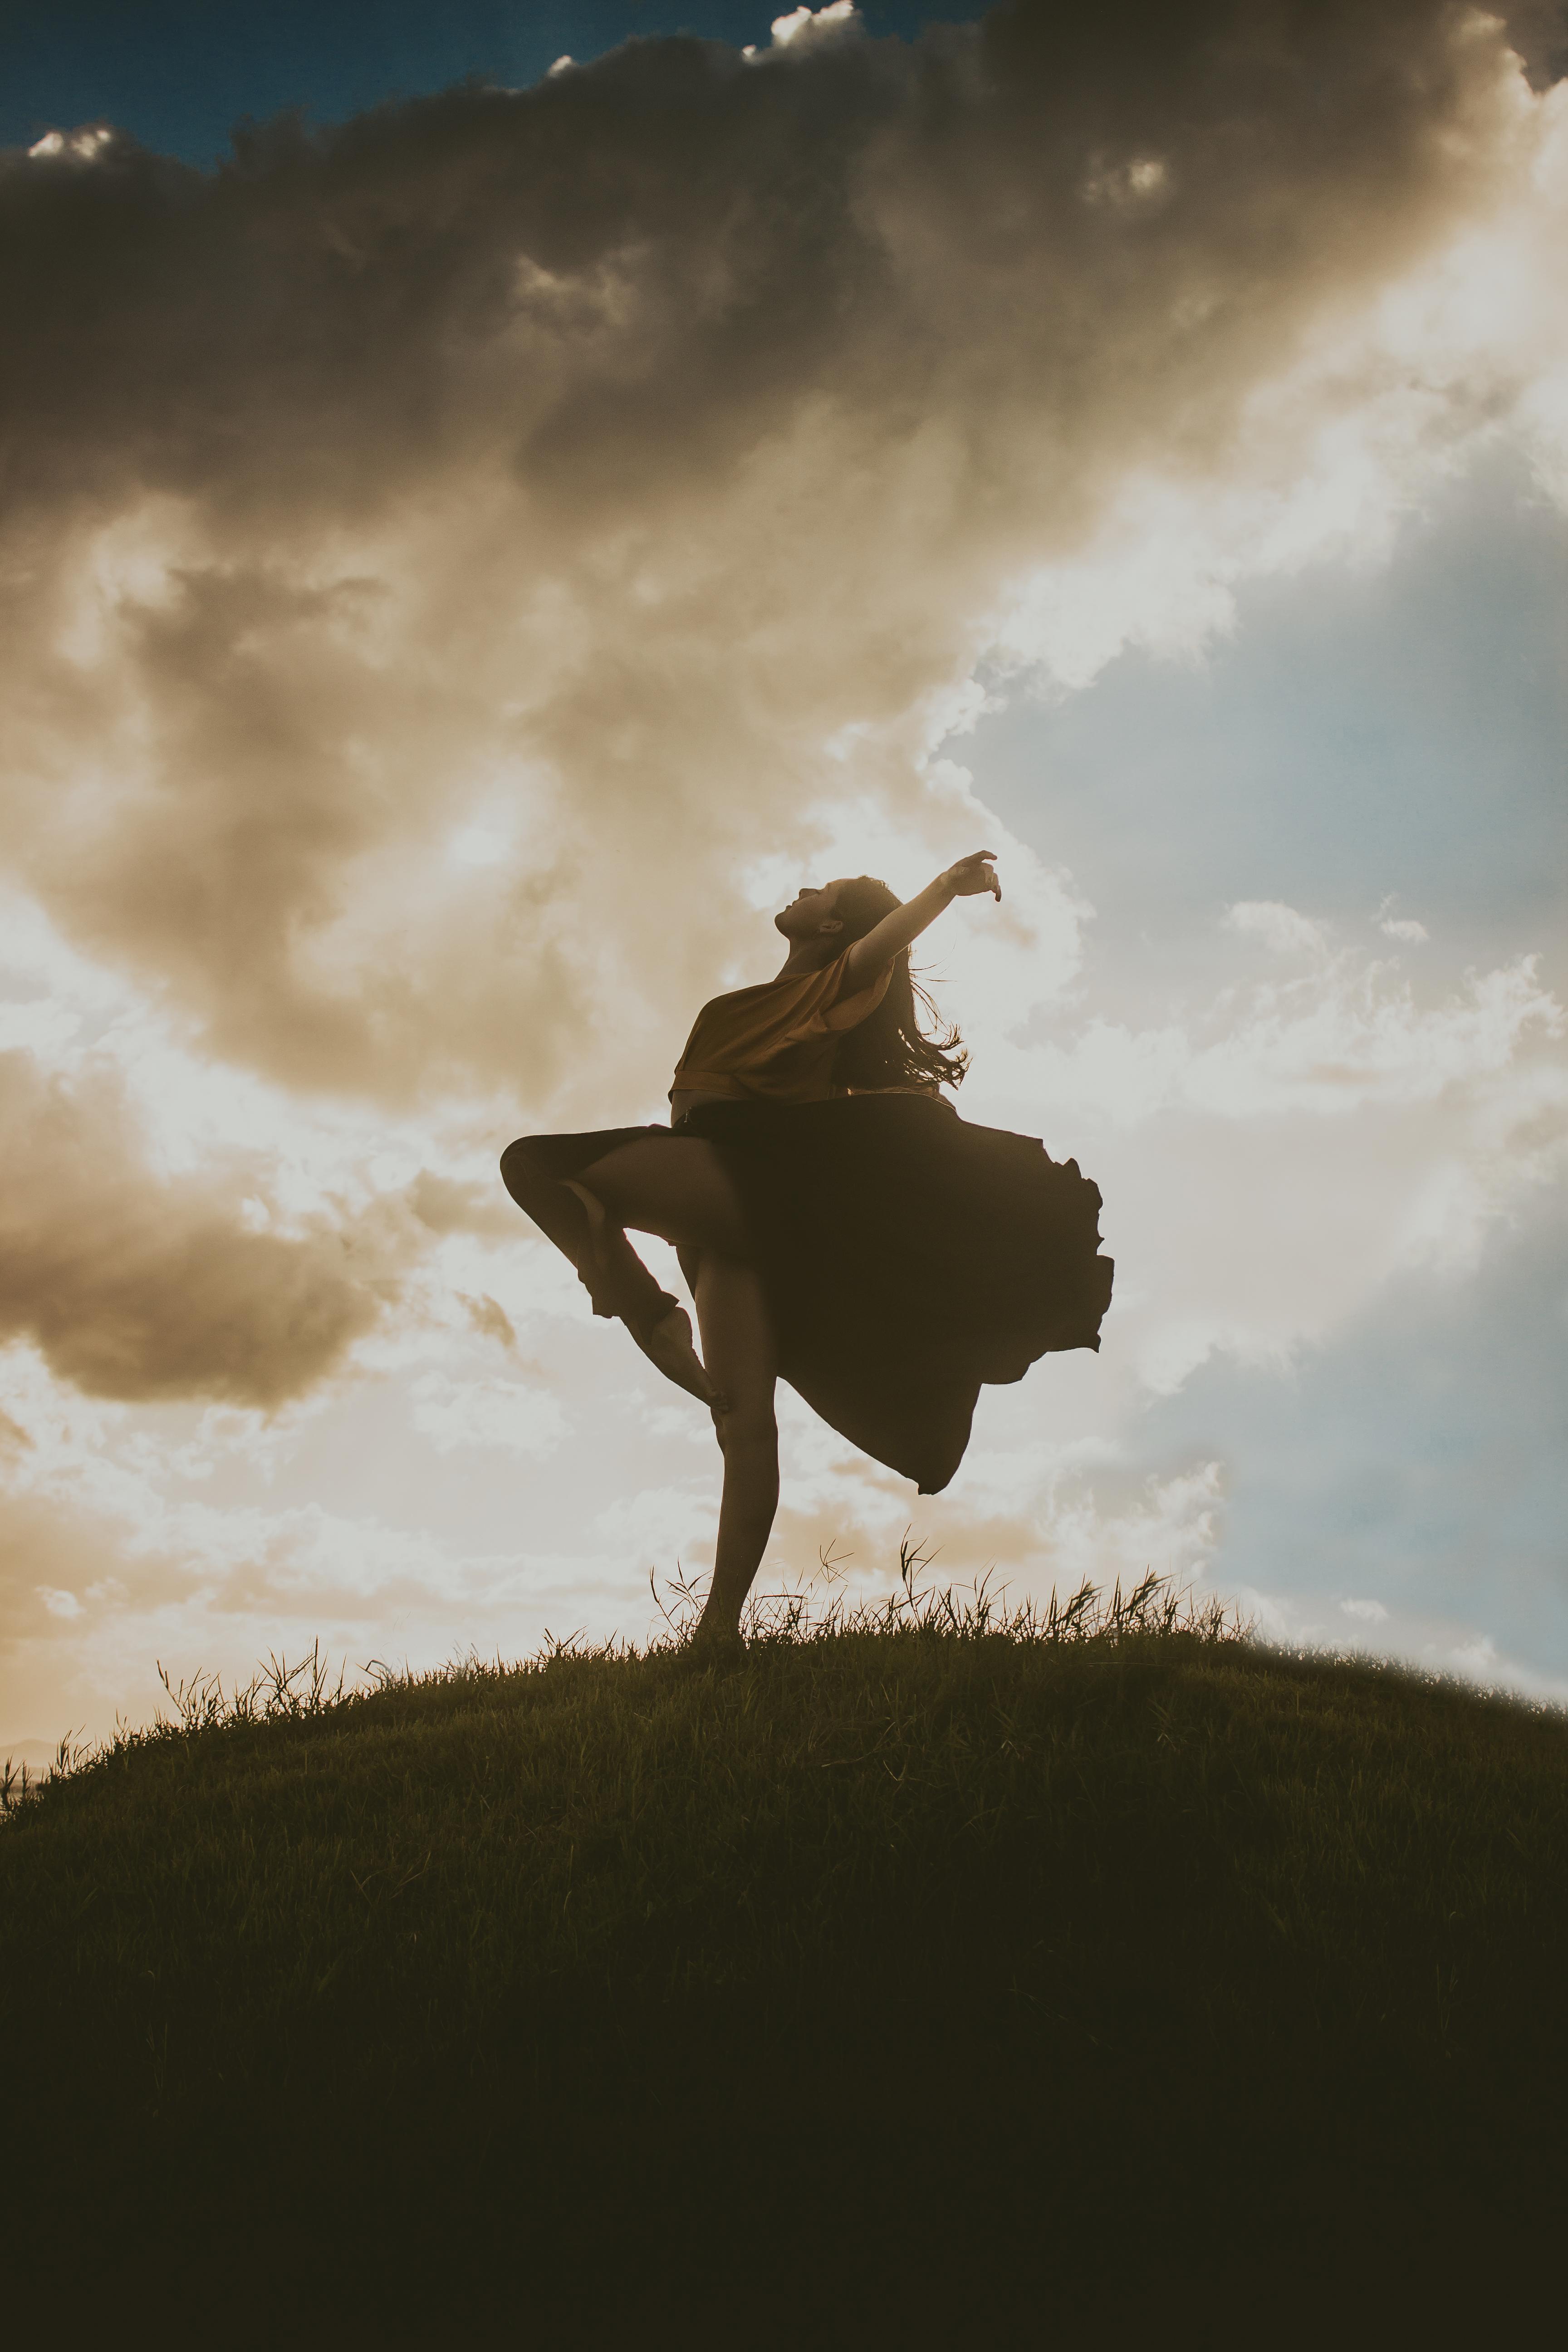 Woman Wearing Black Midi Dress Dancing on a Hill